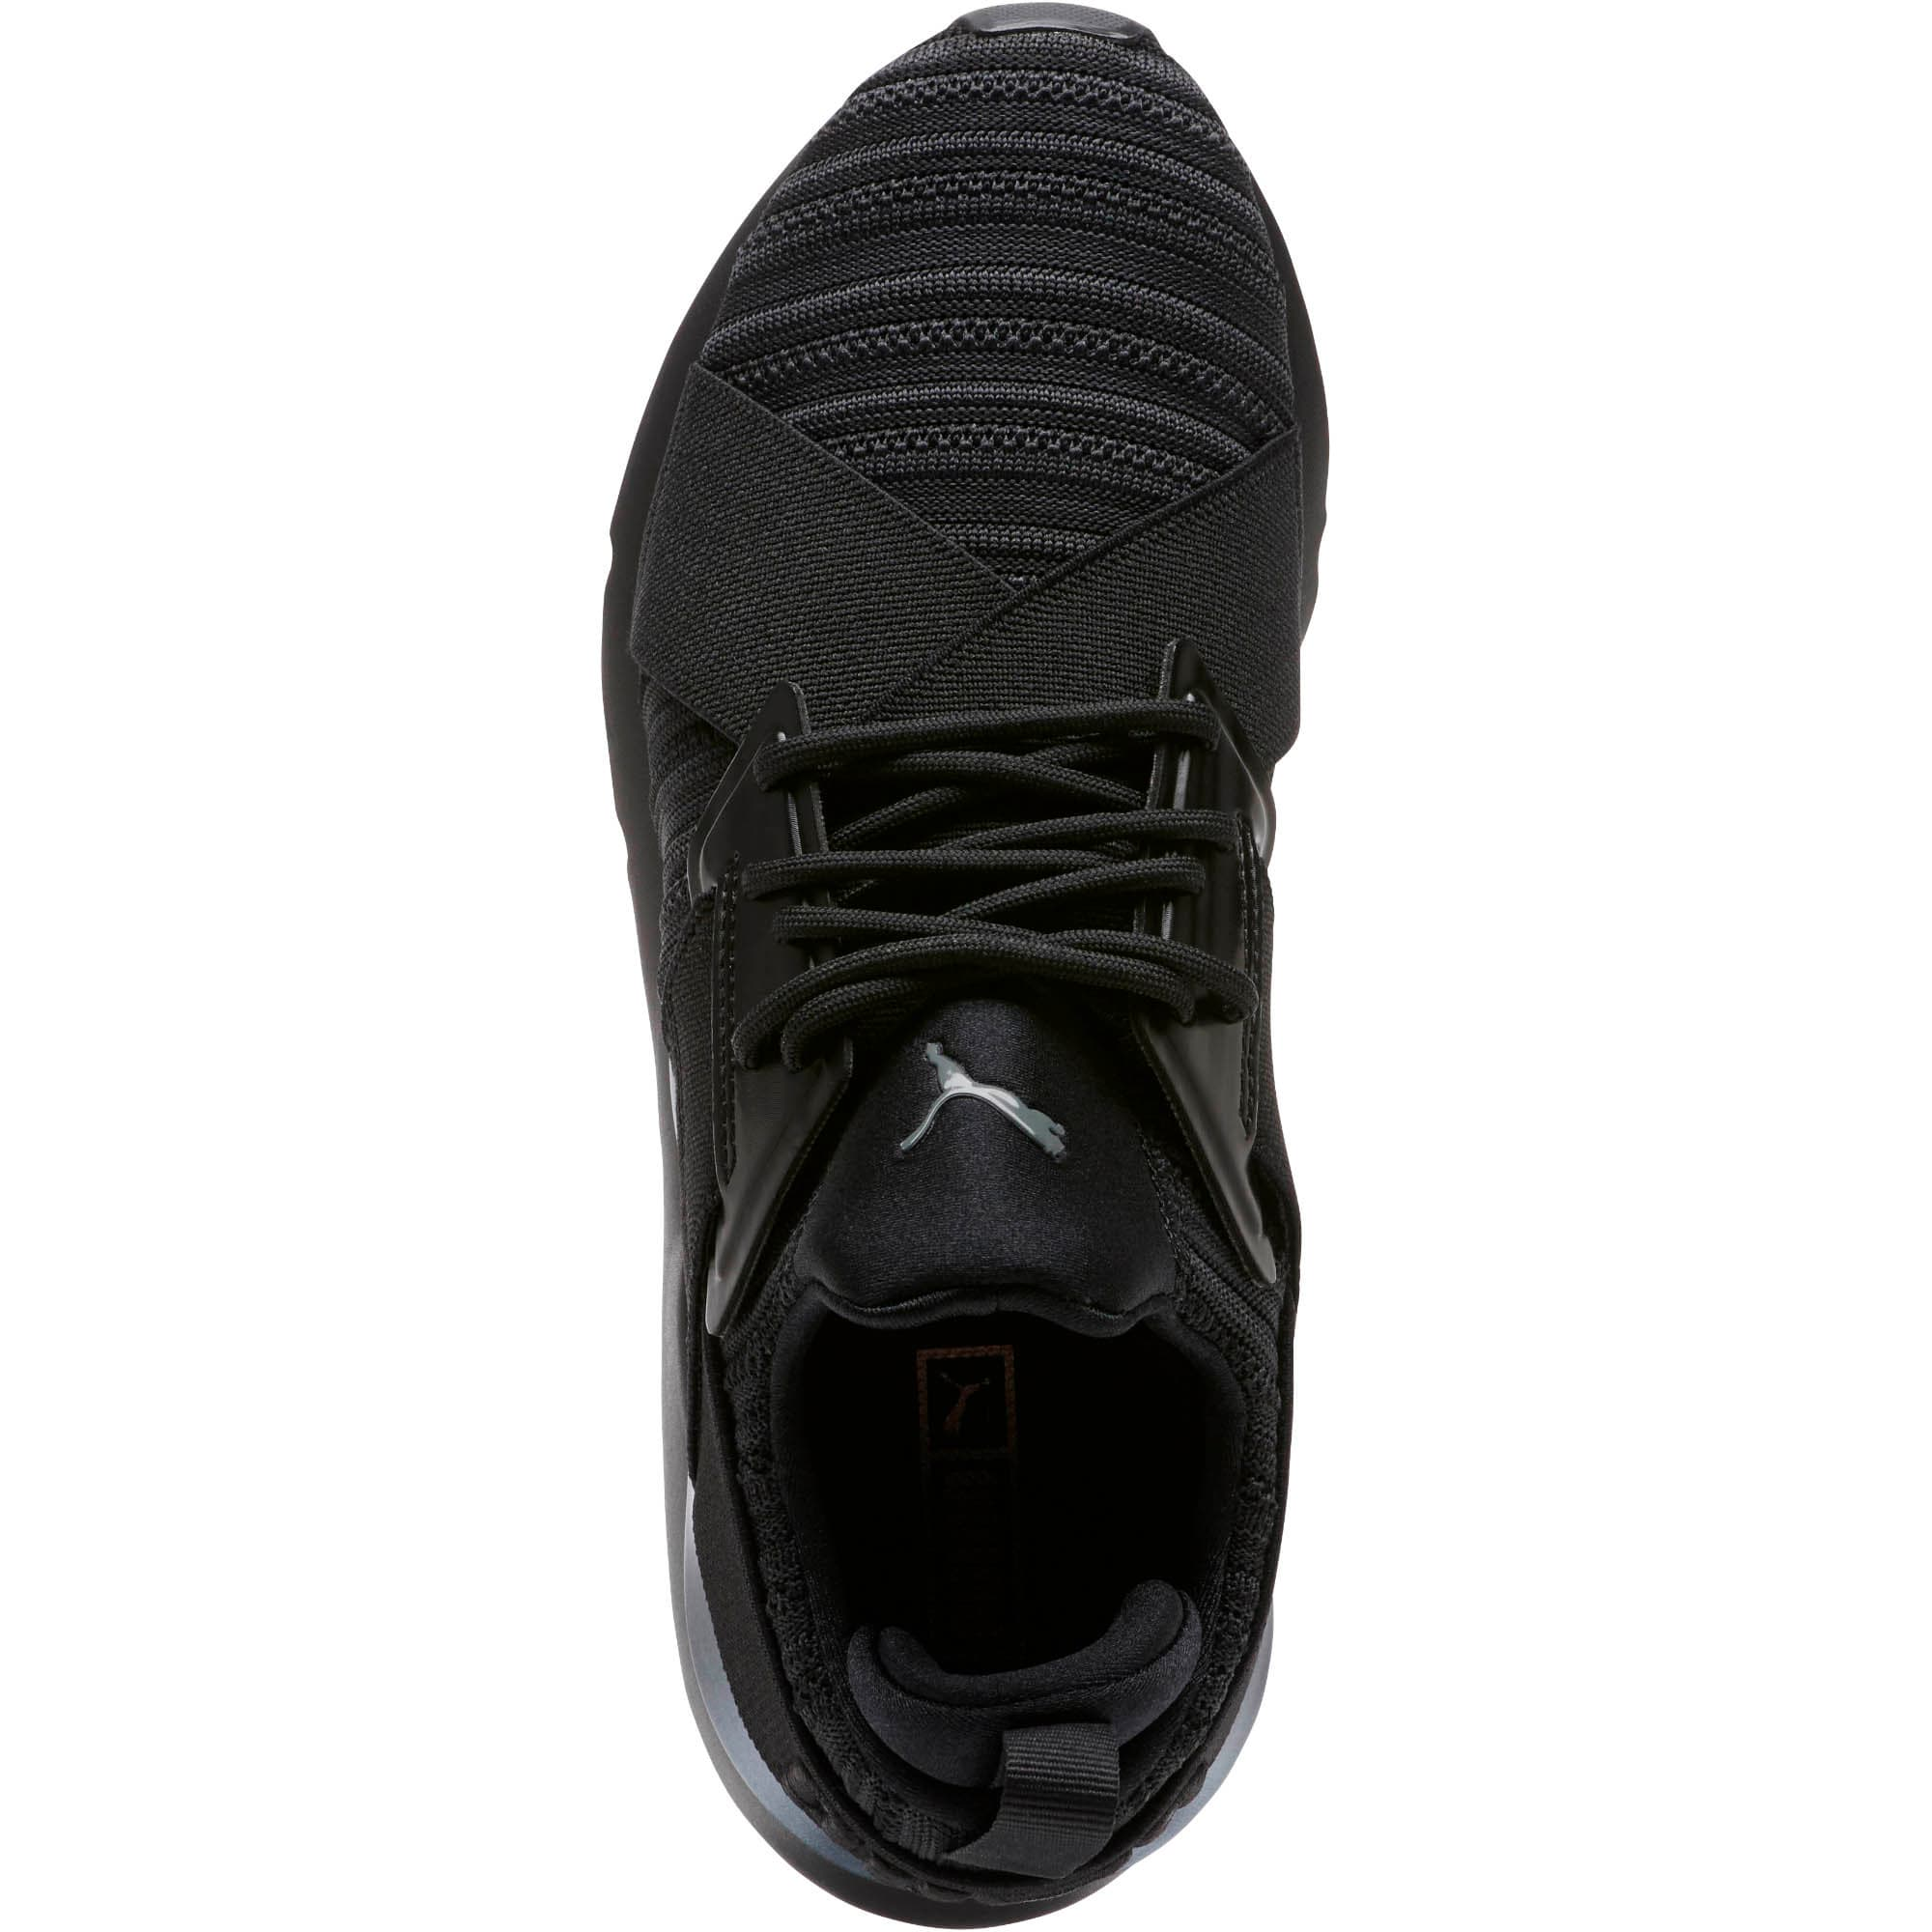 Thumbnail 5 of Muse Knit Women's Sneakers, Iron Gate-Puma Black, medium